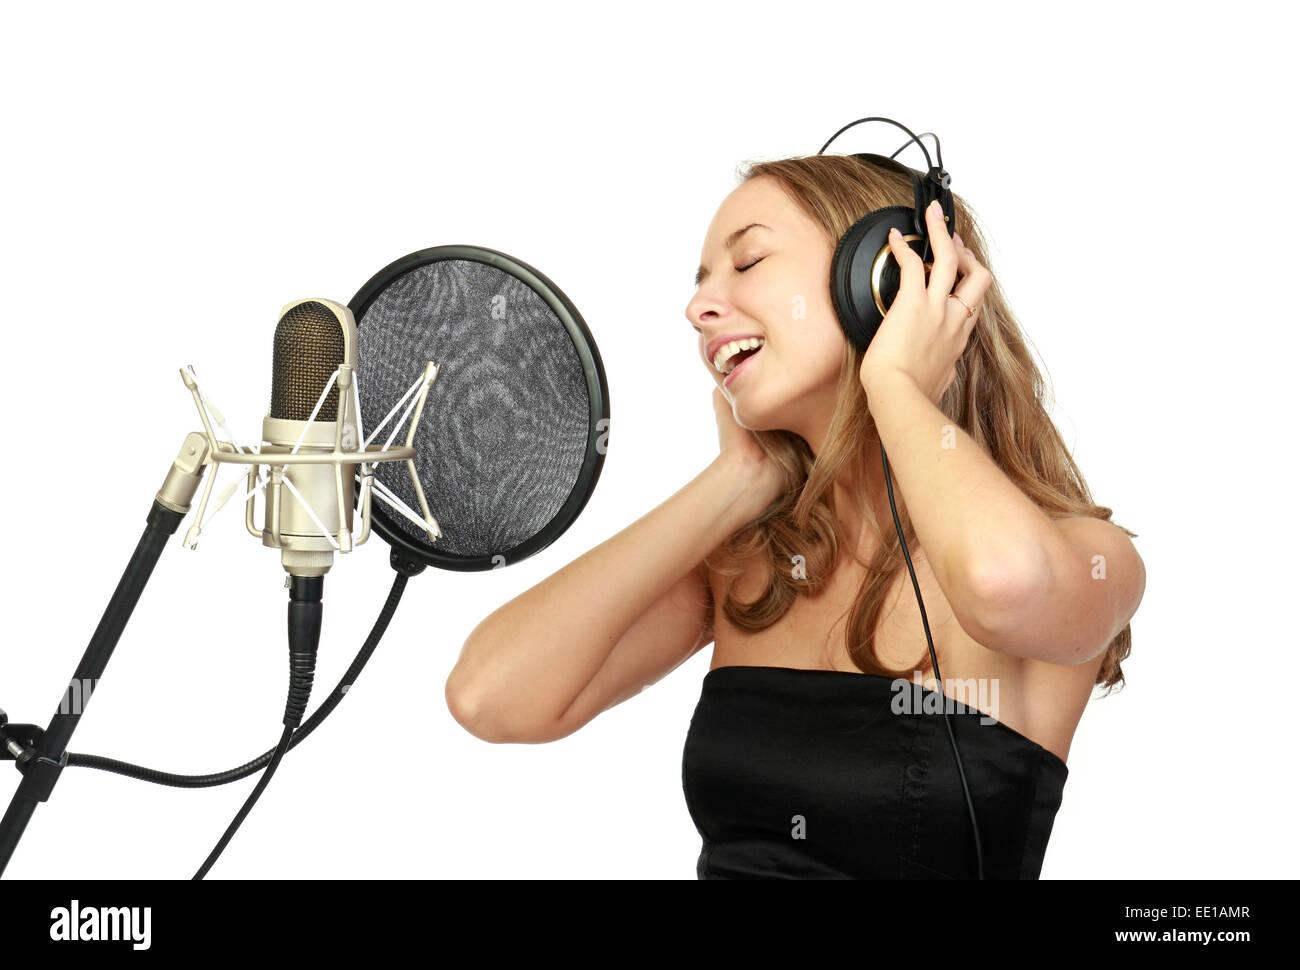 A girl sings - Stock Image